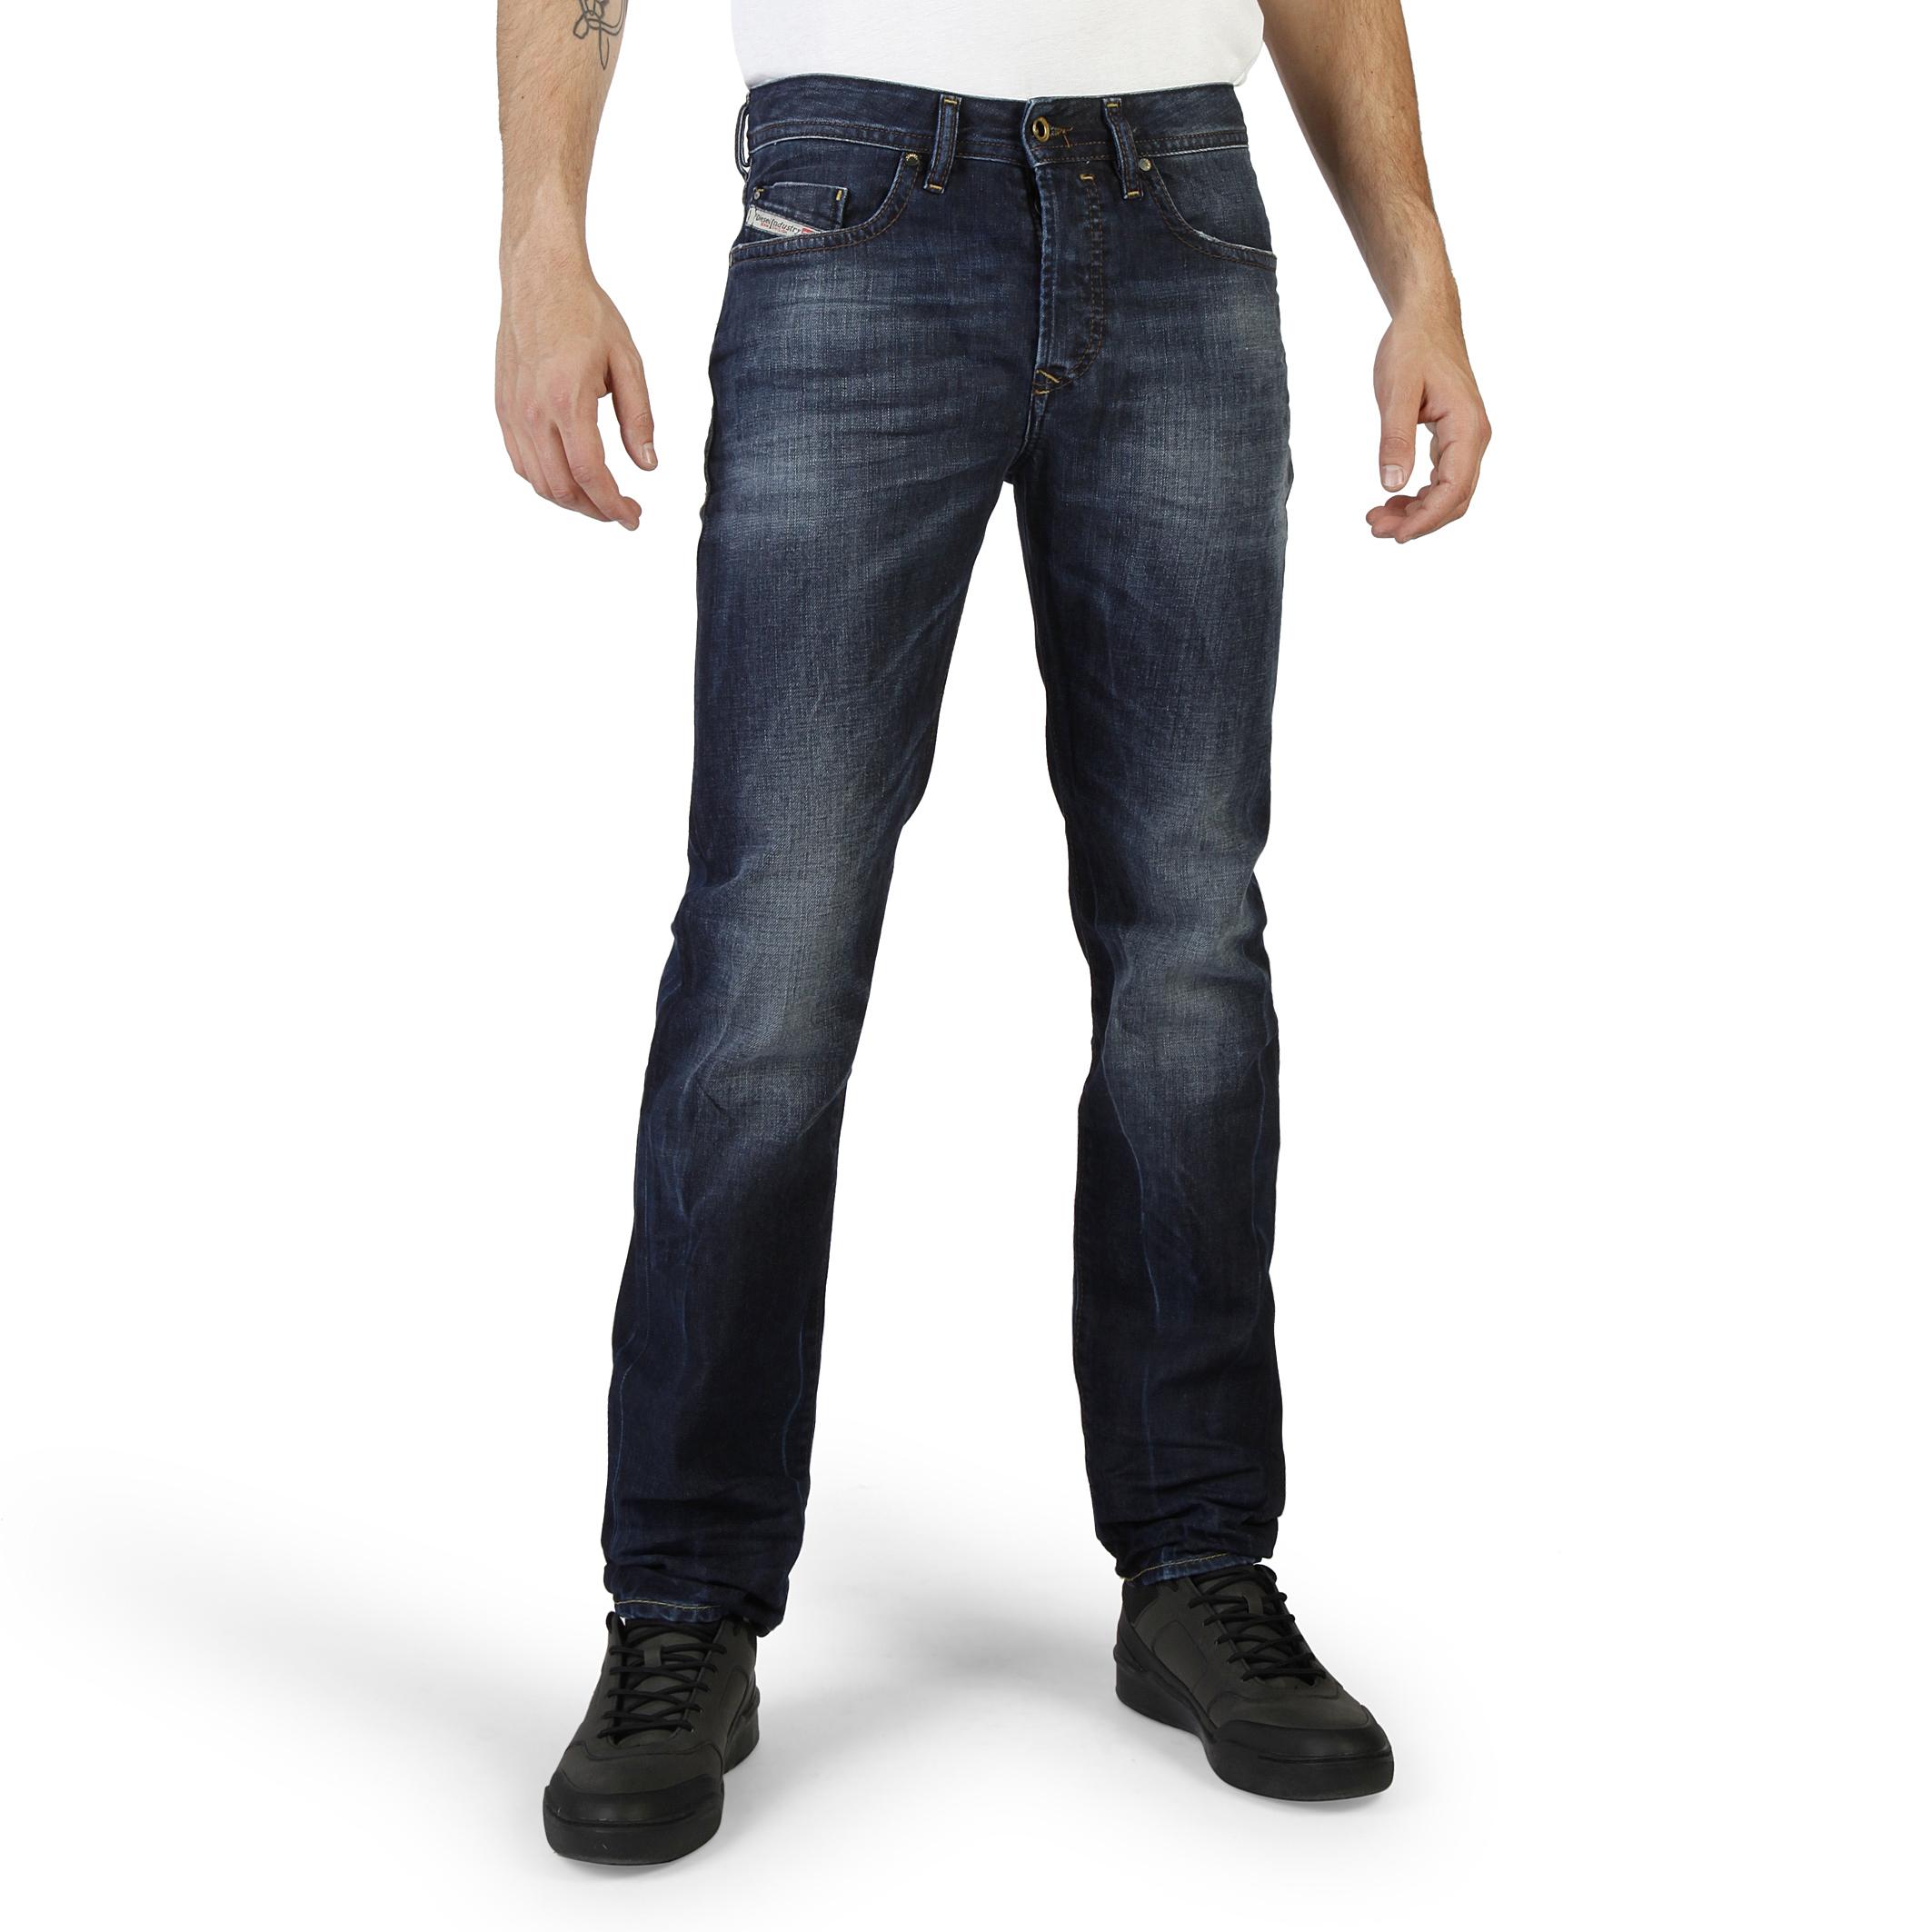 Jeans Diesel BUSTER_L32_00SDHB Uomo Blu 91448